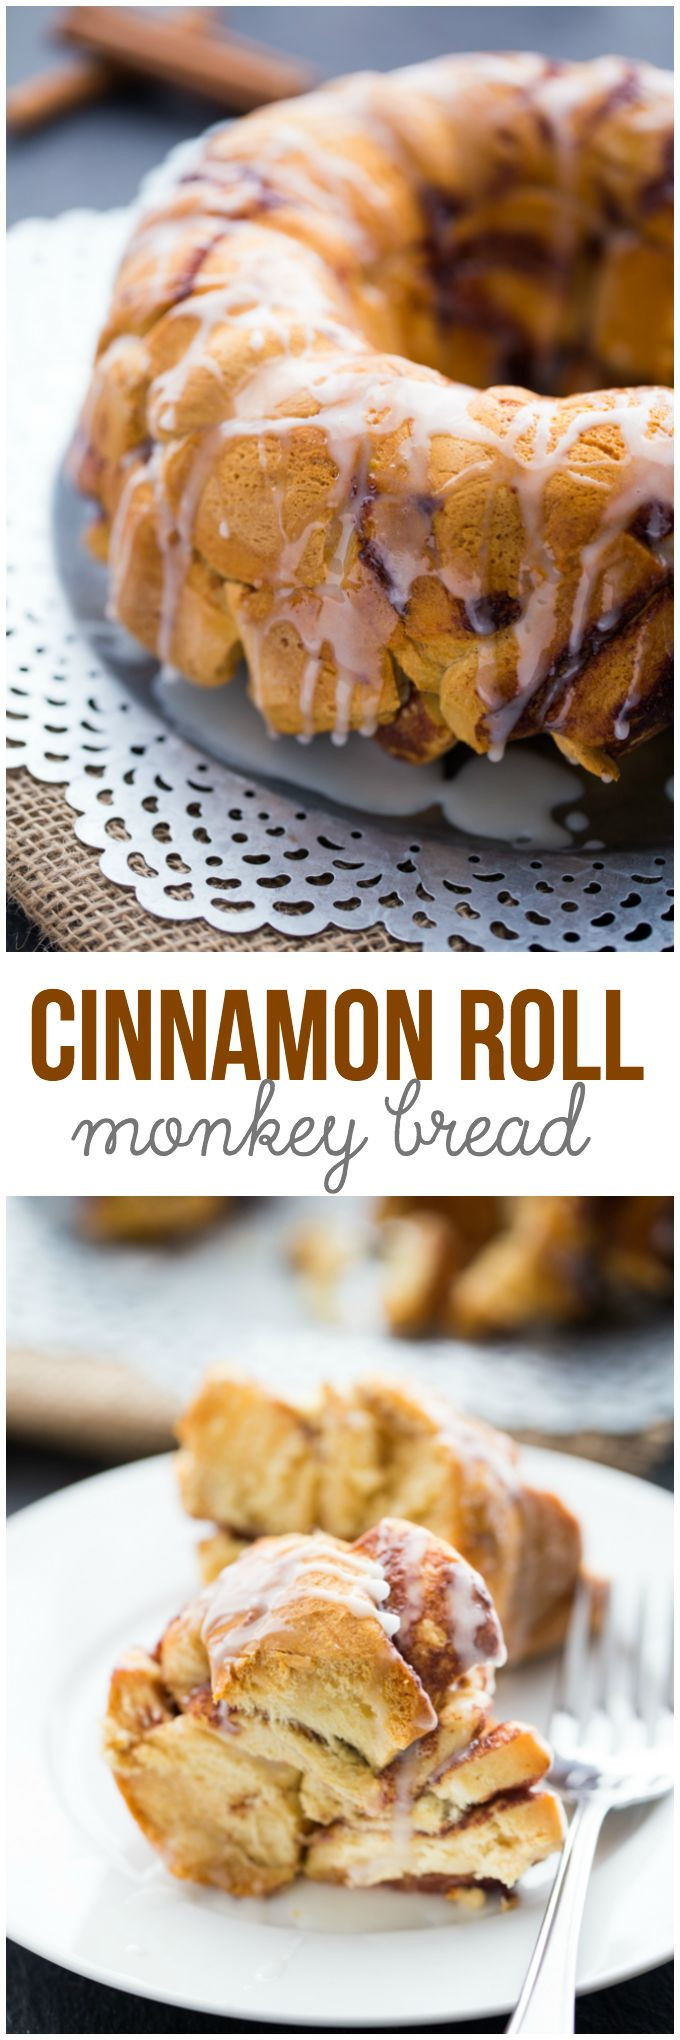 Cinnamon Roll Dessert  Cinnamon Roll Monkey Bread Recipe